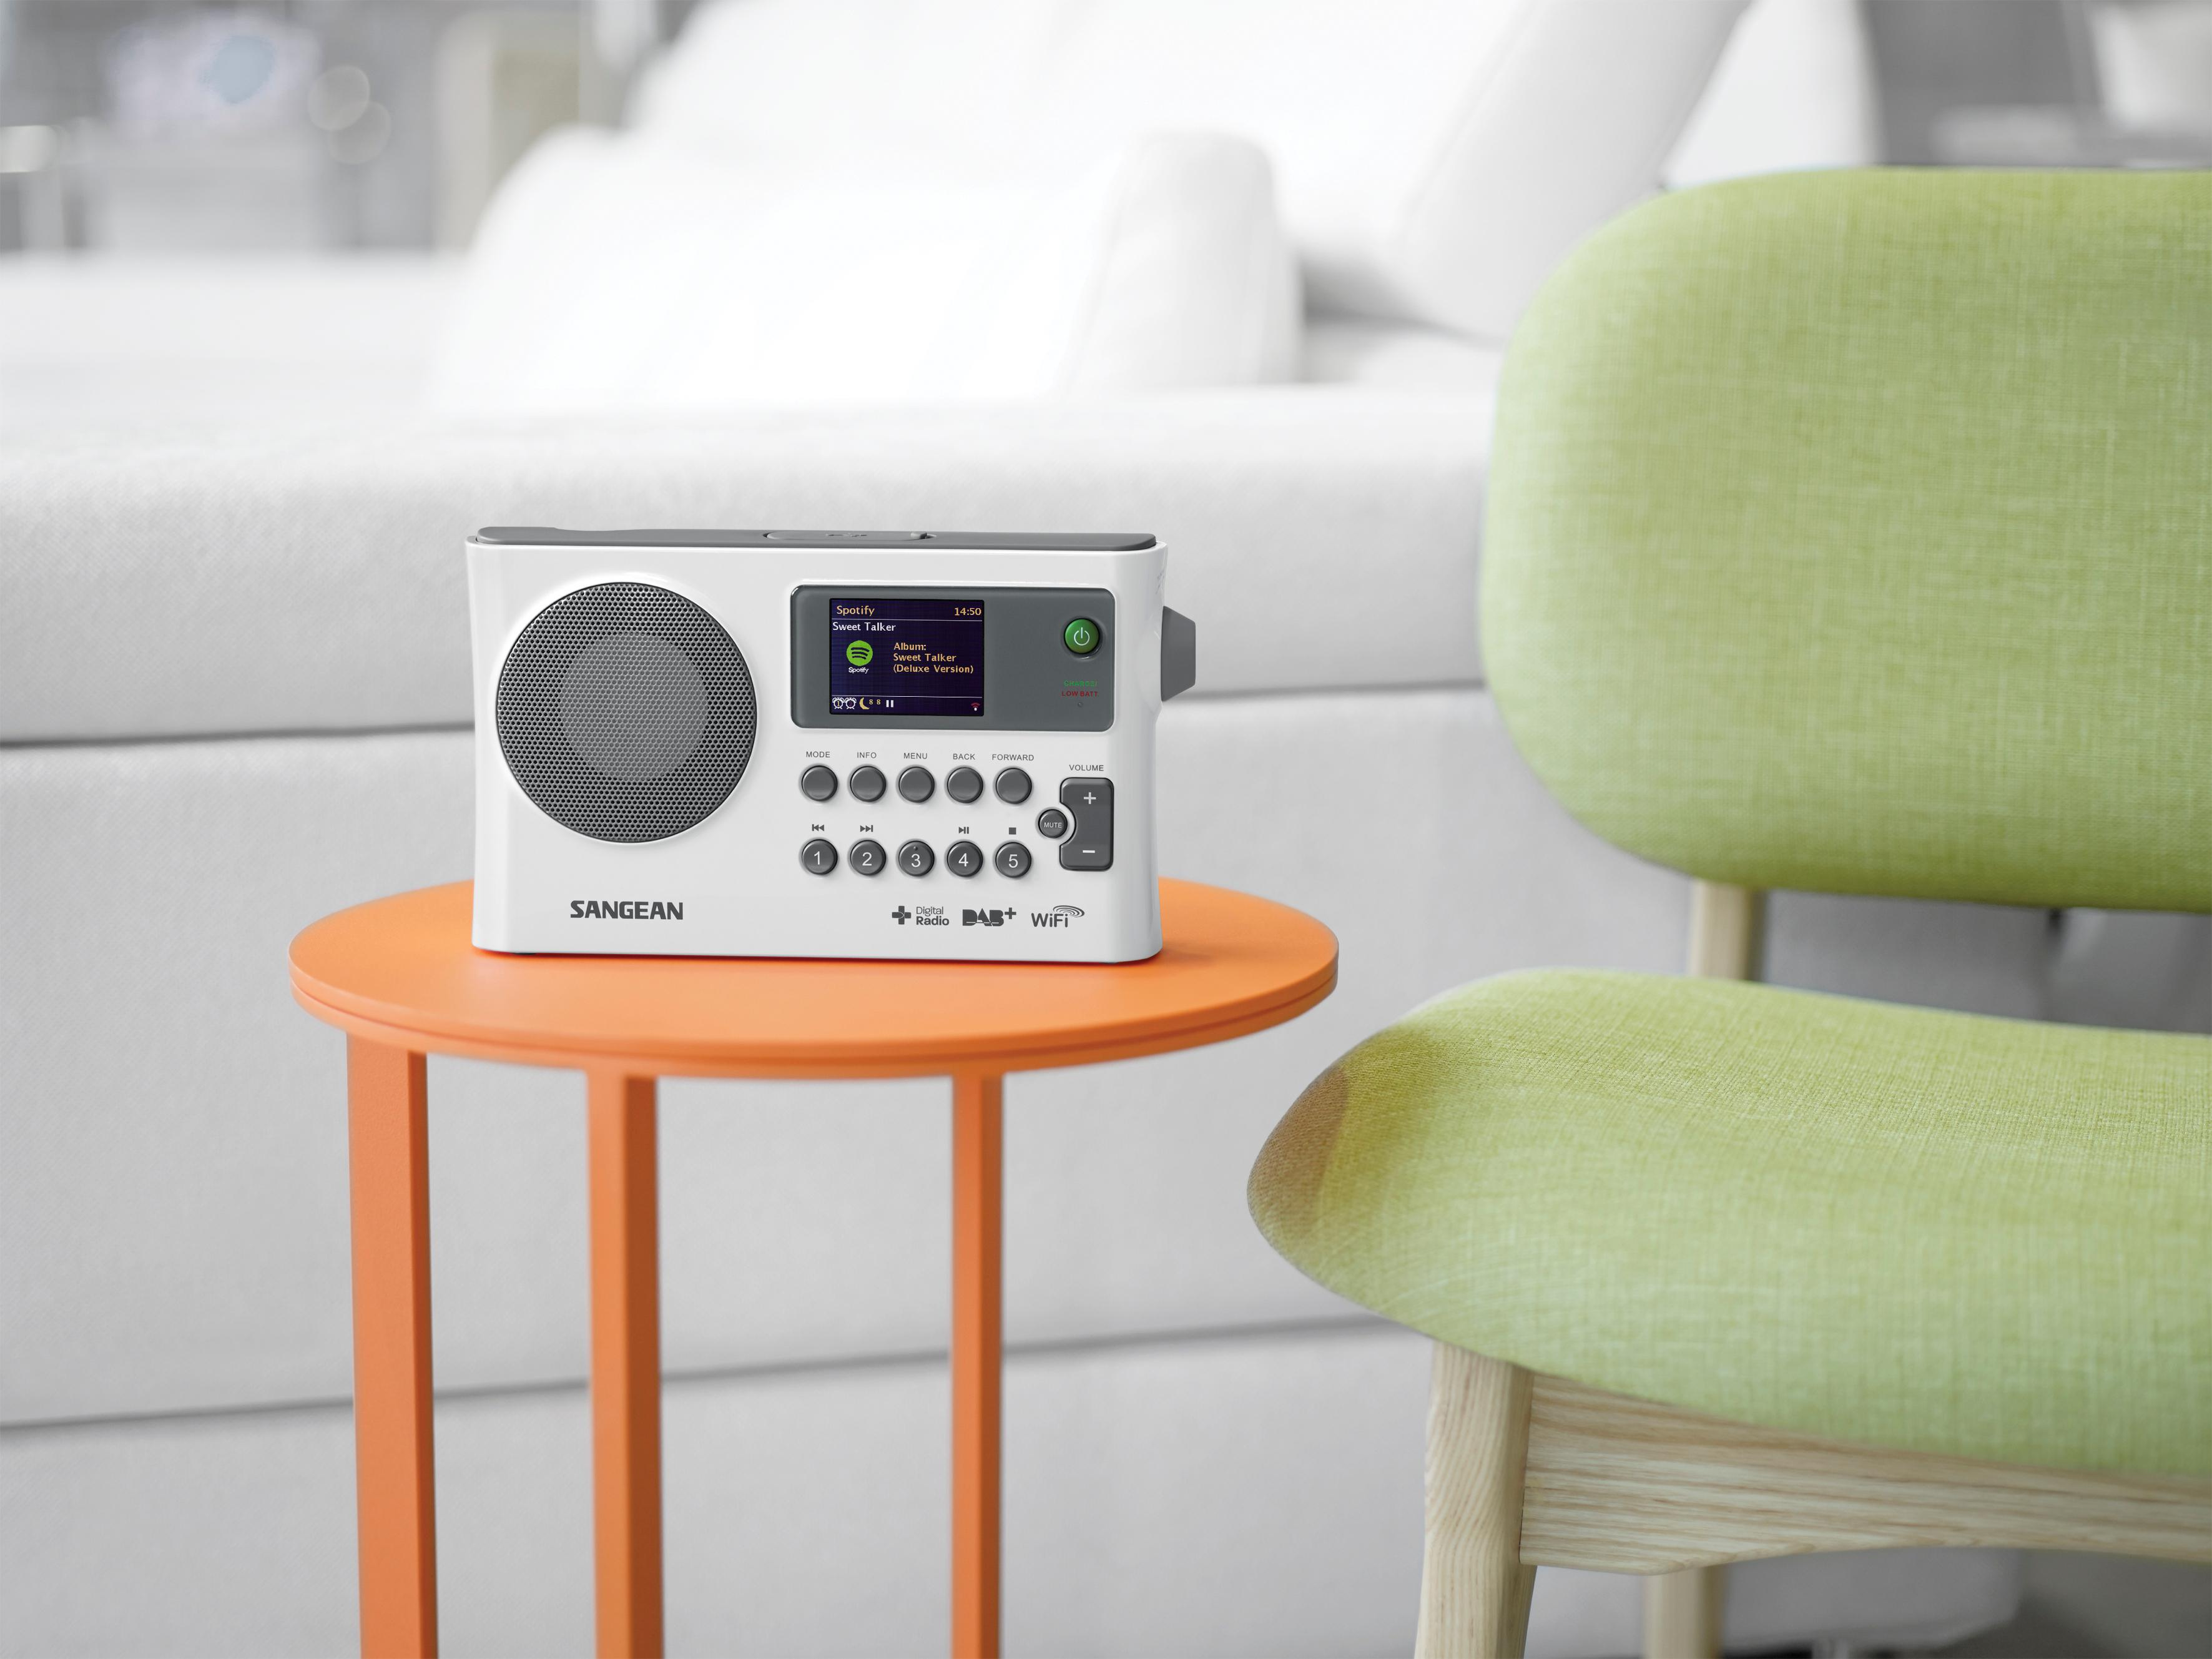 sangean wfr 28c tragbares internetradio dab ukw tuner. Black Bedroom Furniture Sets. Home Design Ideas